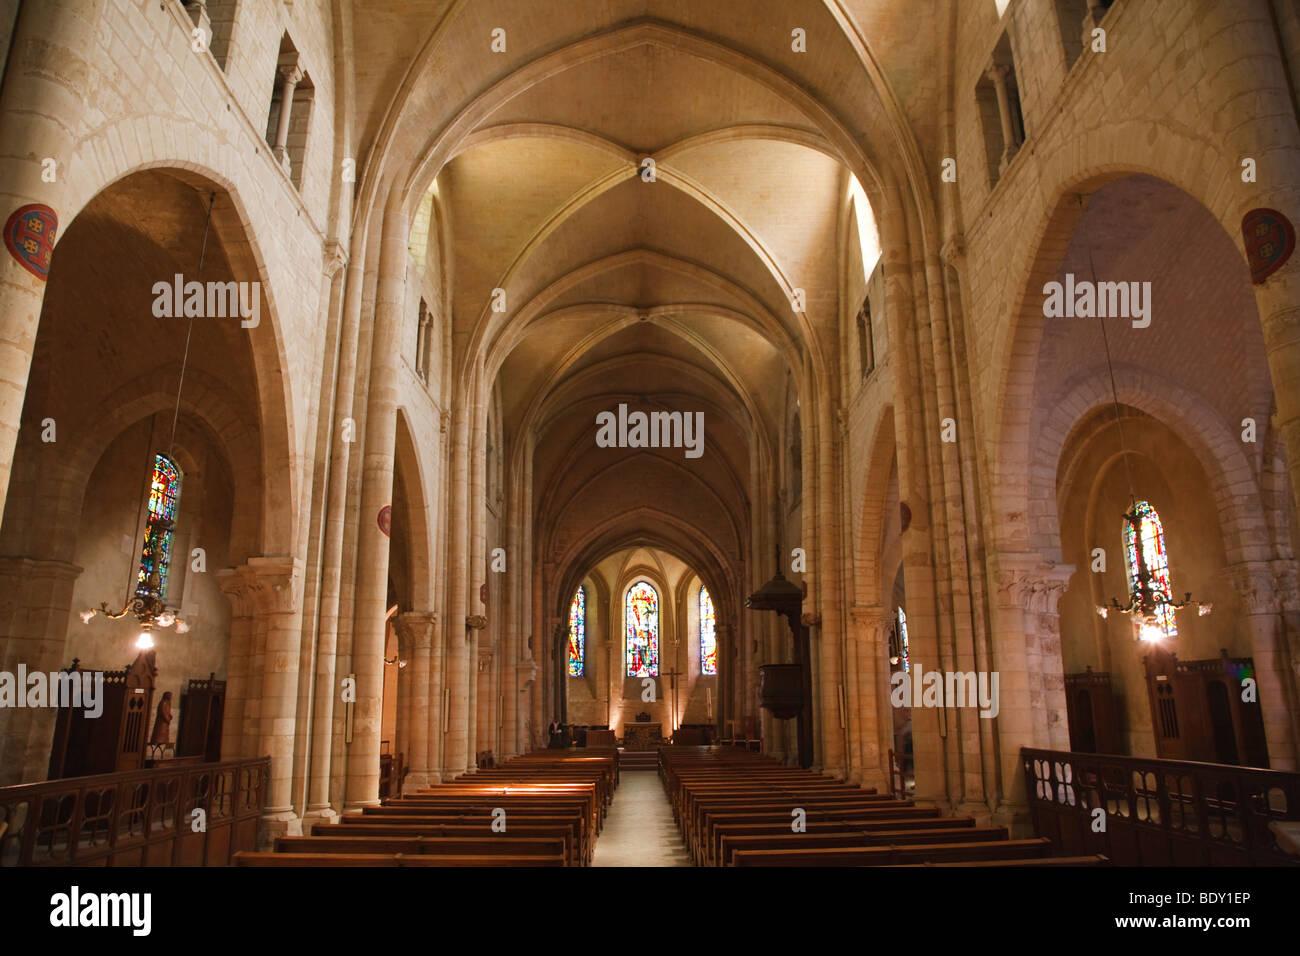 interior of st pierre de montmartre church in paris france stock photo 25794798 alamy. Black Bedroom Furniture Sets. Home Design Ideas